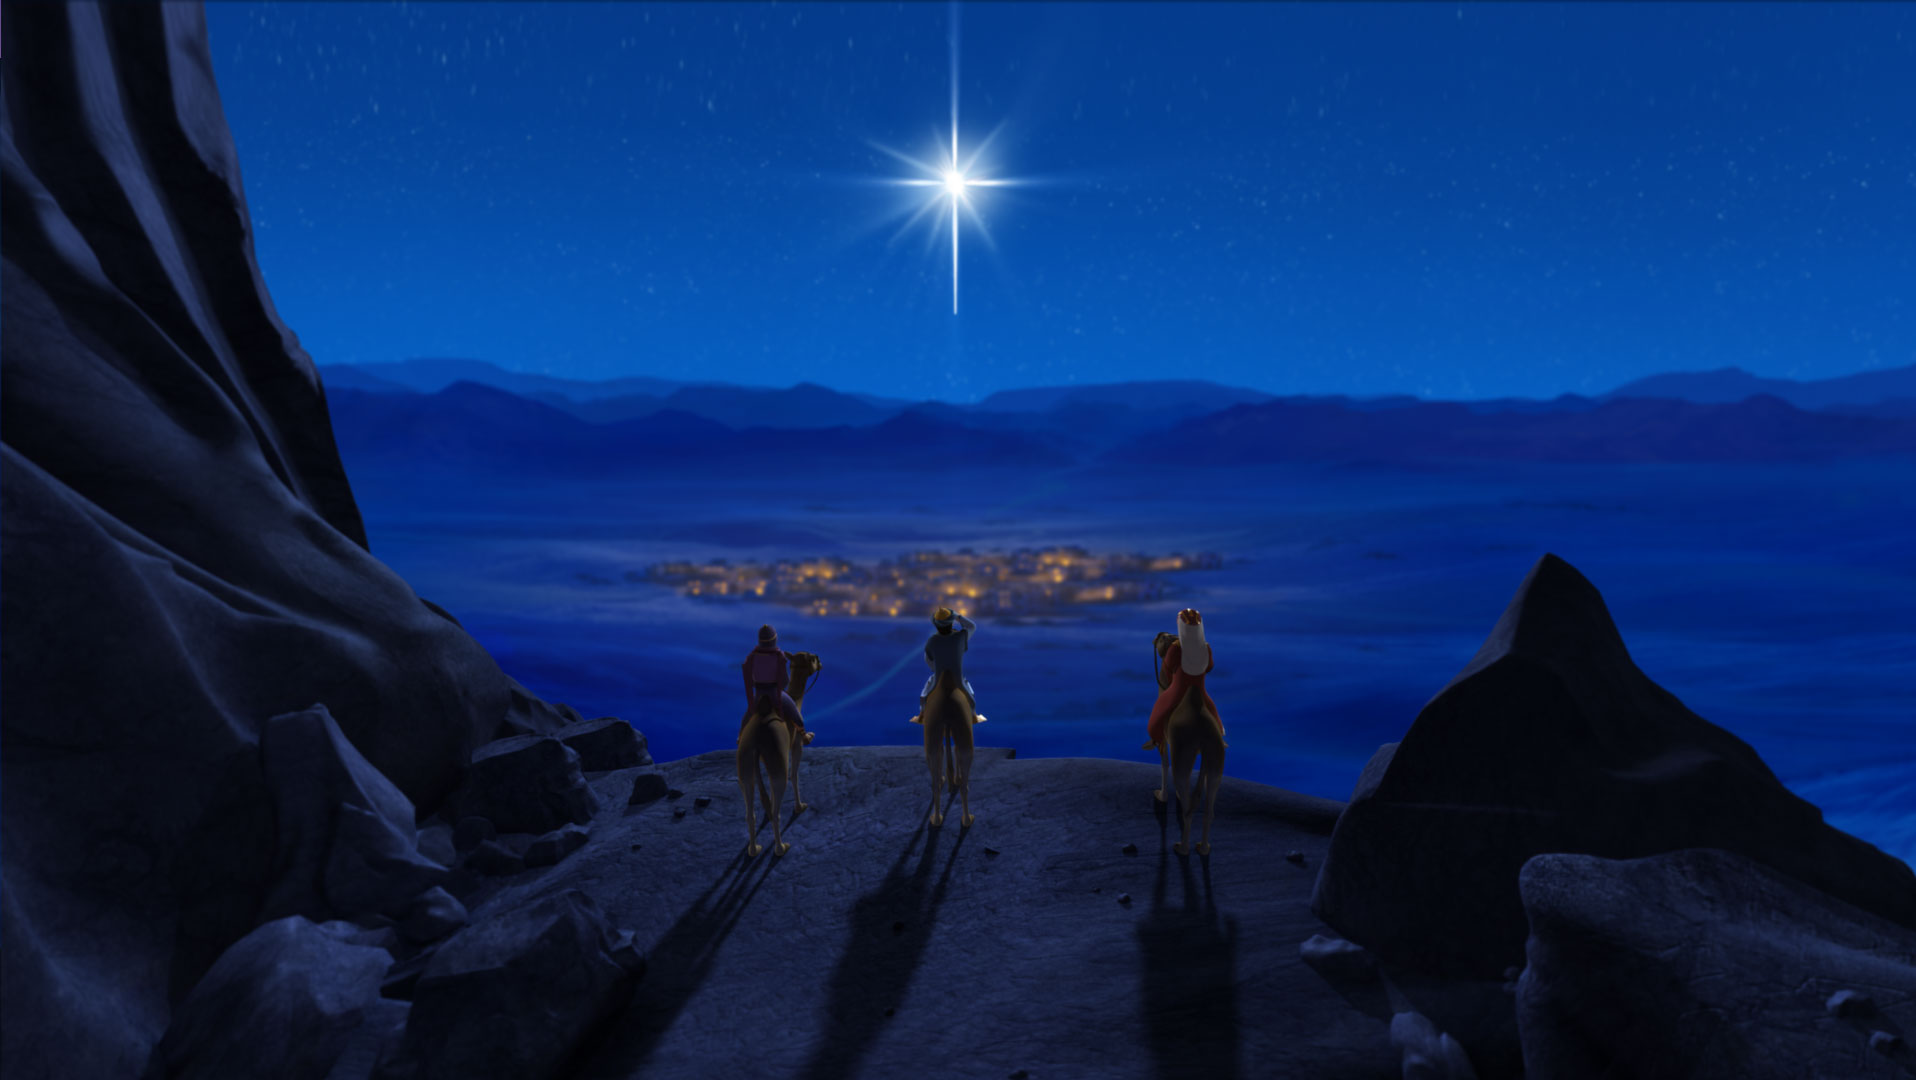 <h2>اولین کریسمس</h2>